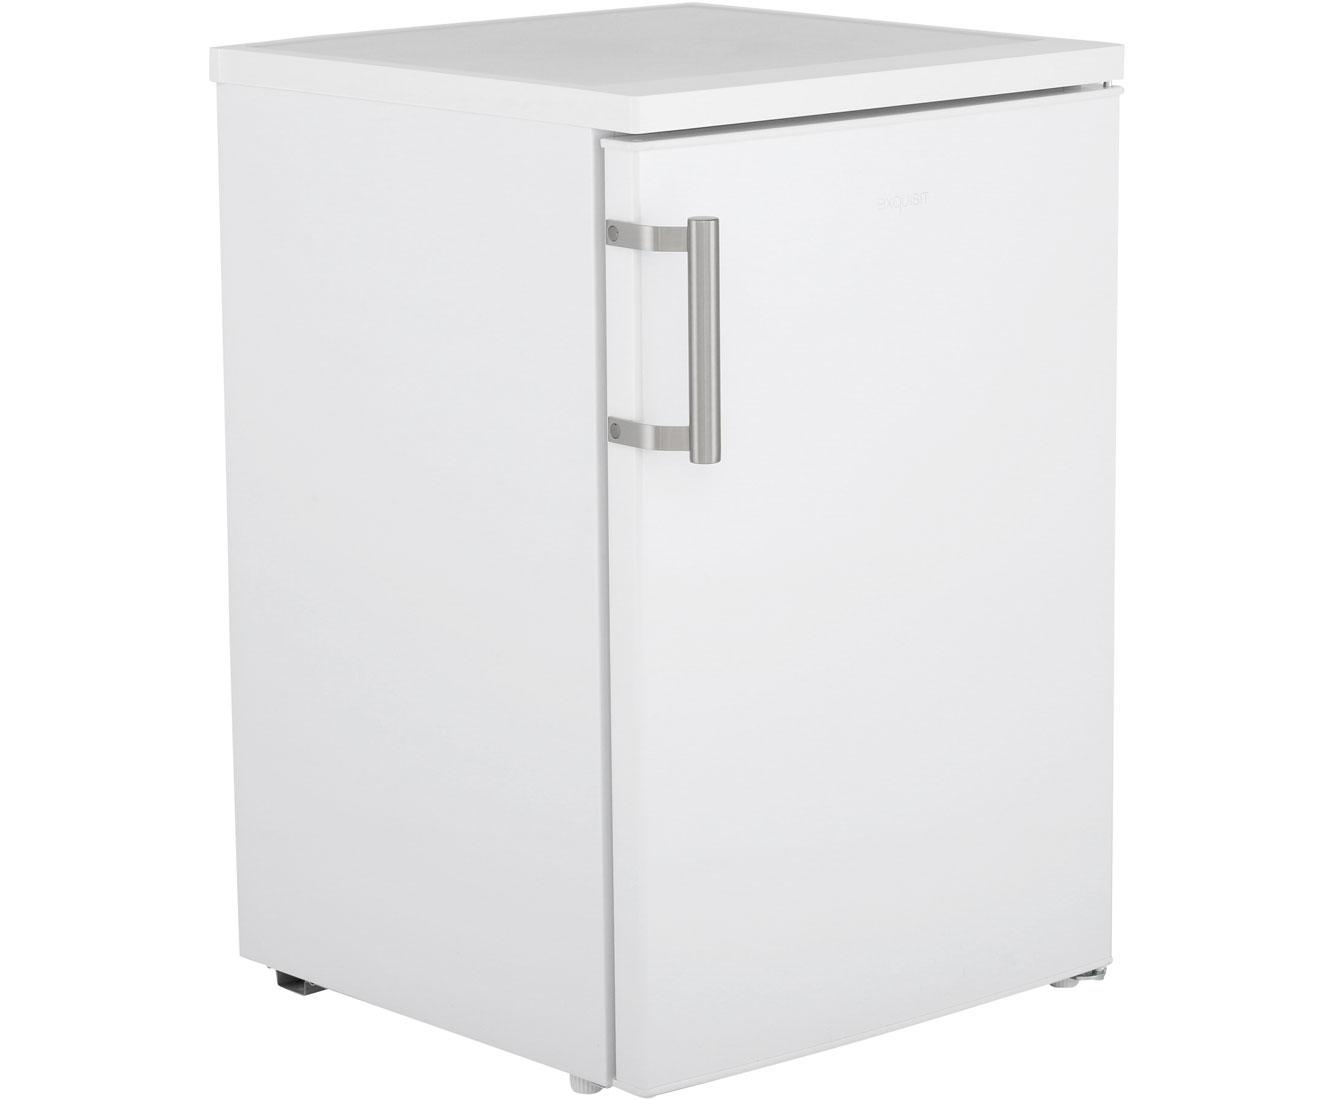 Bosch Kühlschrank Macht Komische Geräusche : Side by side kühlschrank macht komische geräusche defekter side